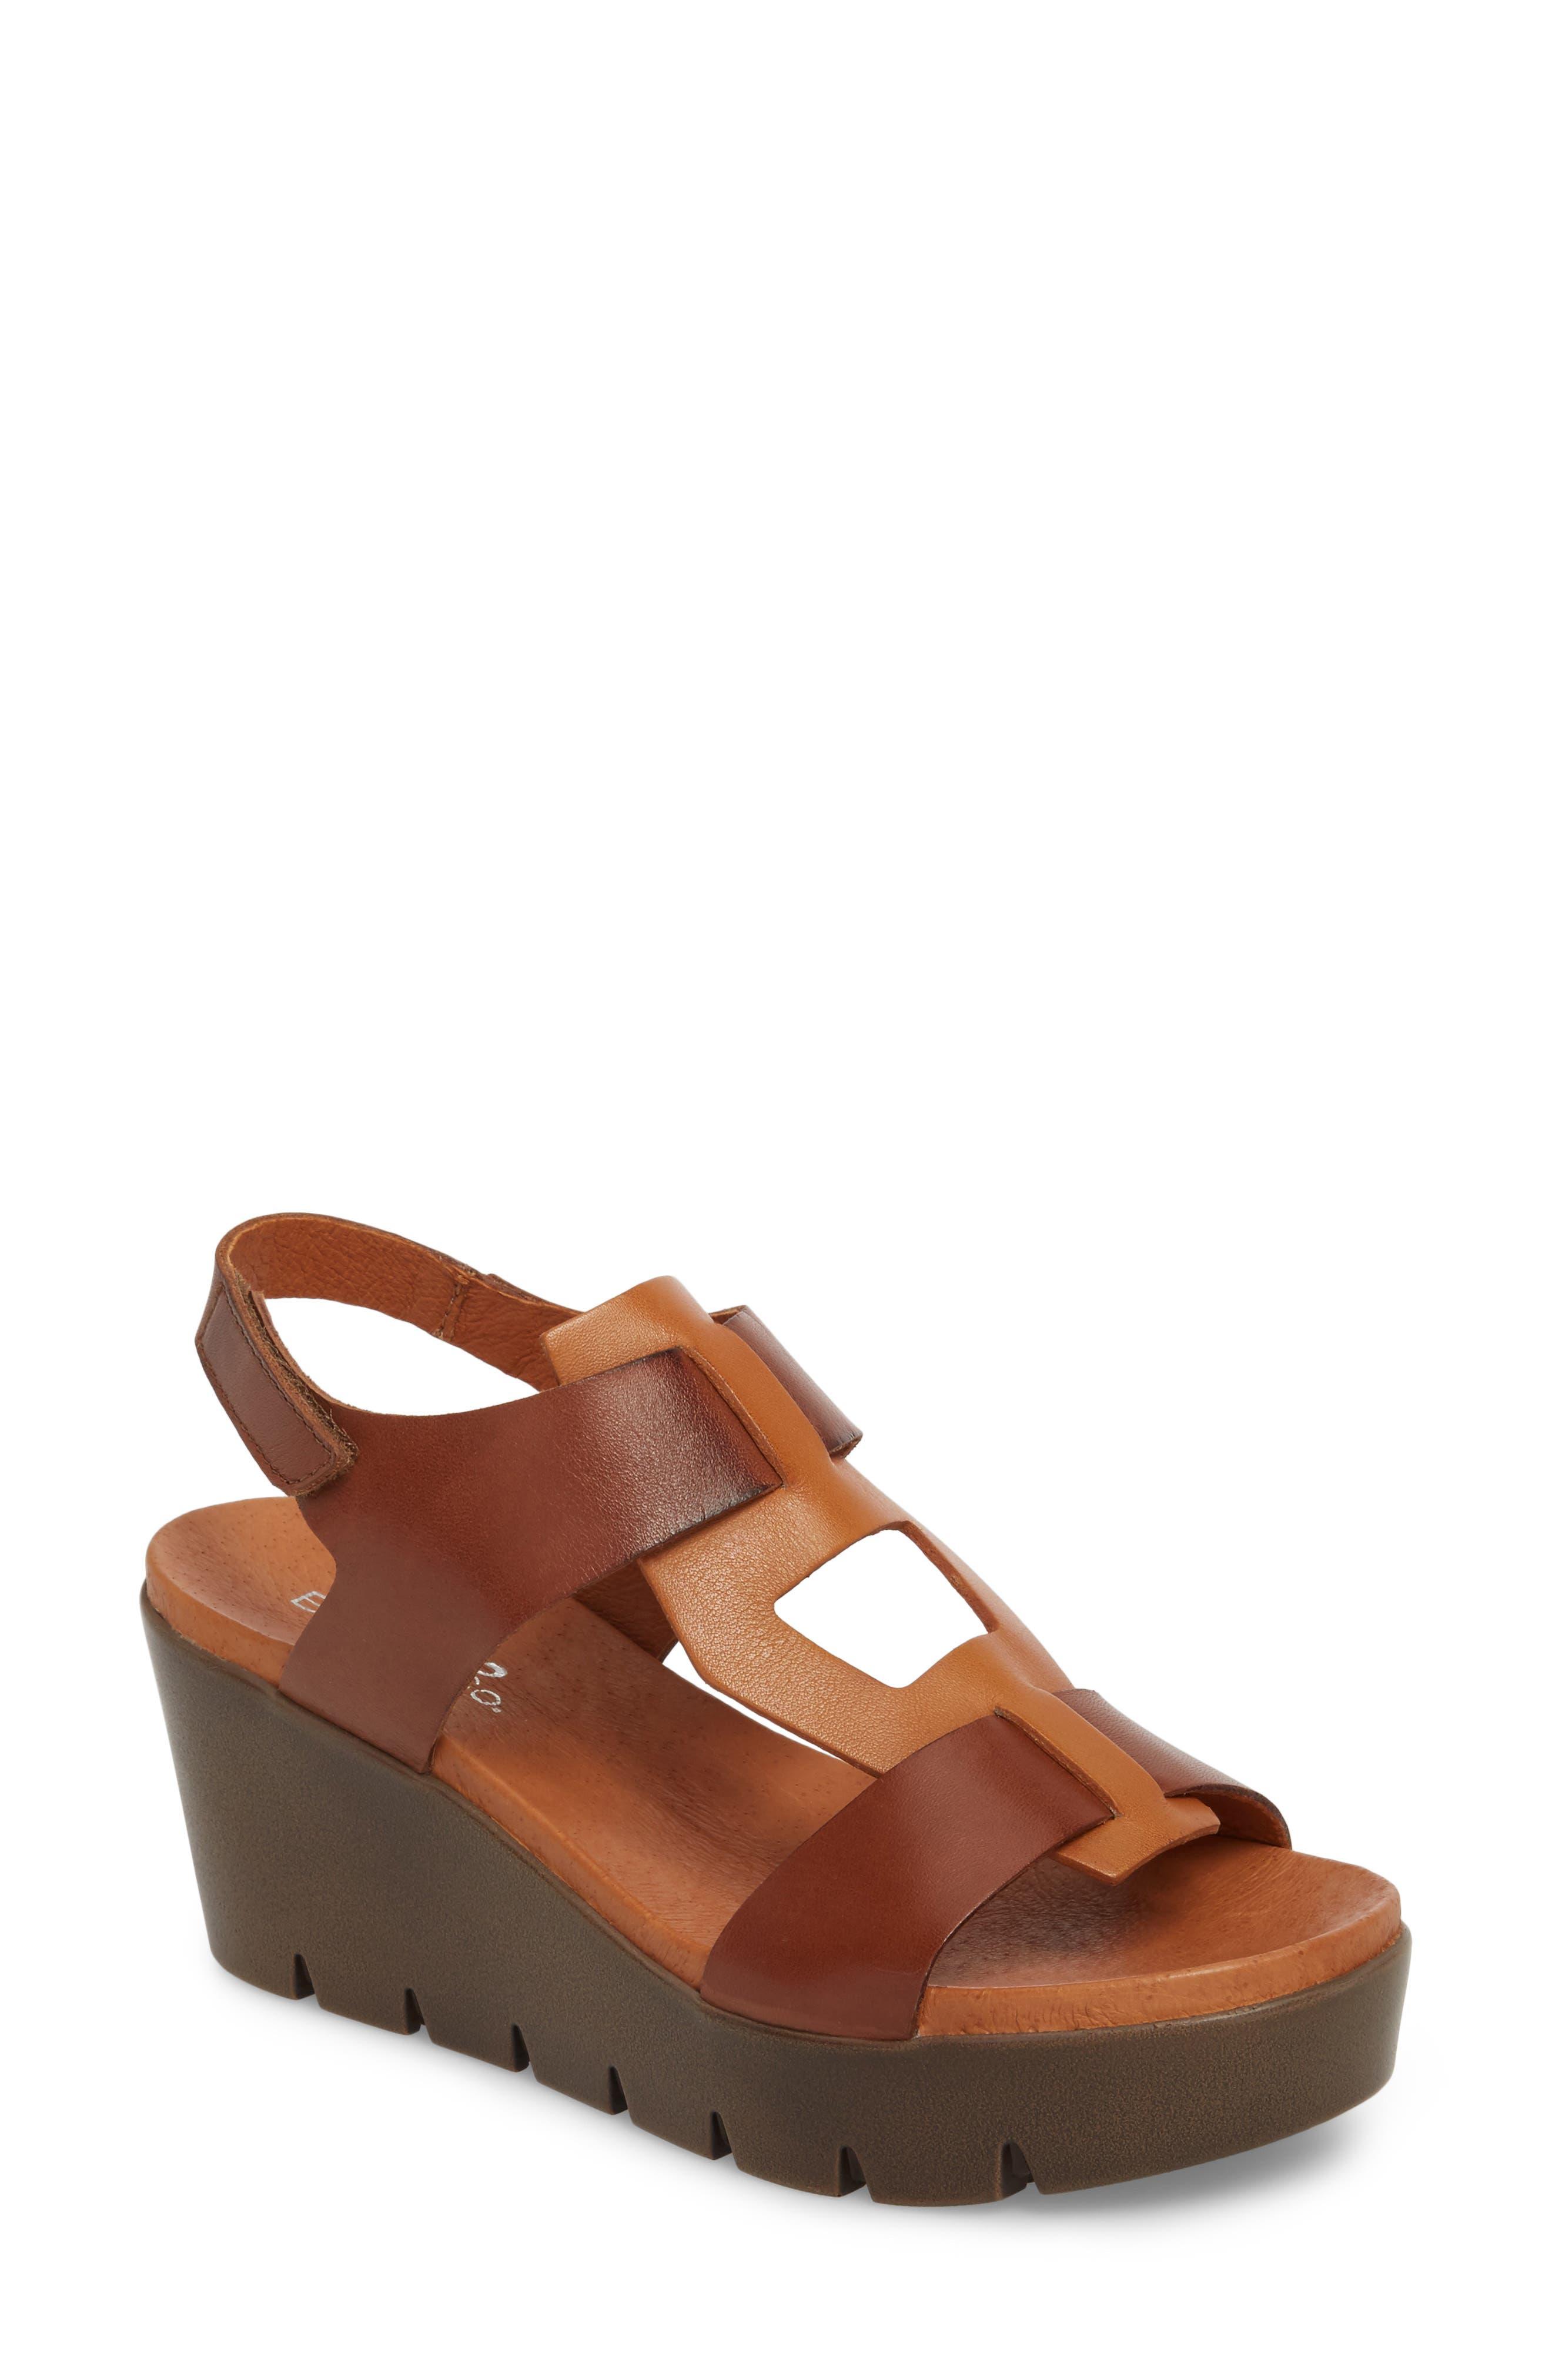 Bos. & Co. Somo Platform Wedge Sandal - Brown